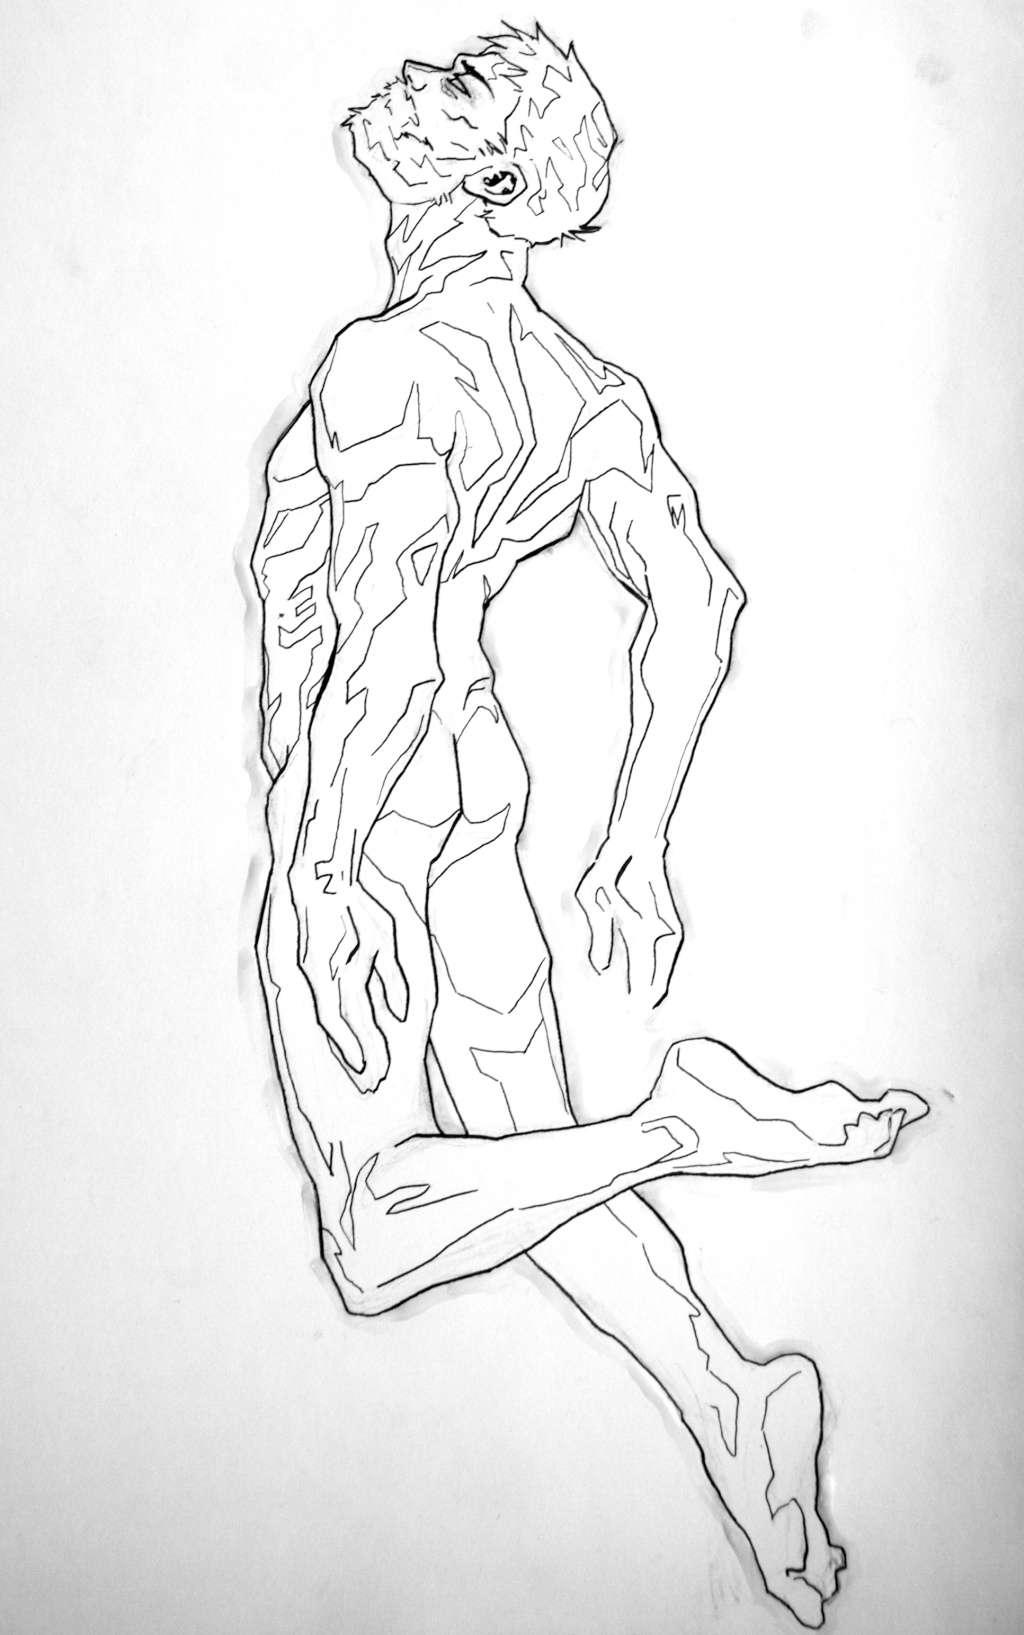 -La Galerie d'Okhamii- - Page 8 Imgp8412